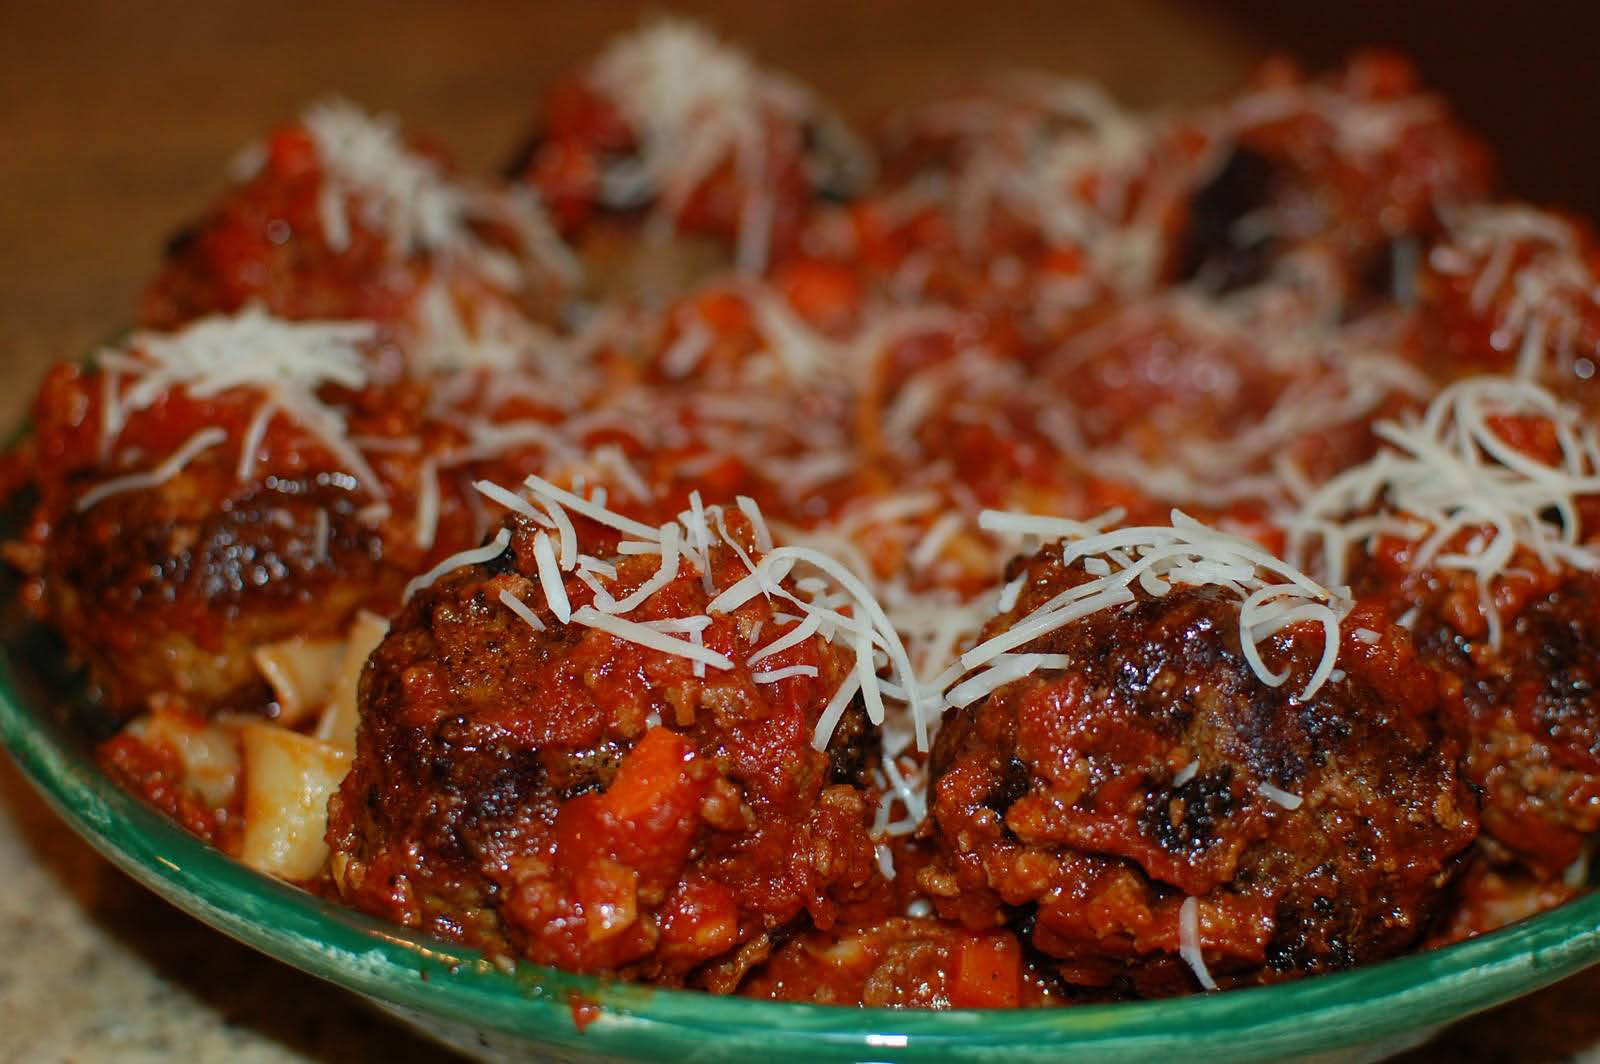 Papa's Italian style Homemade Meatballs